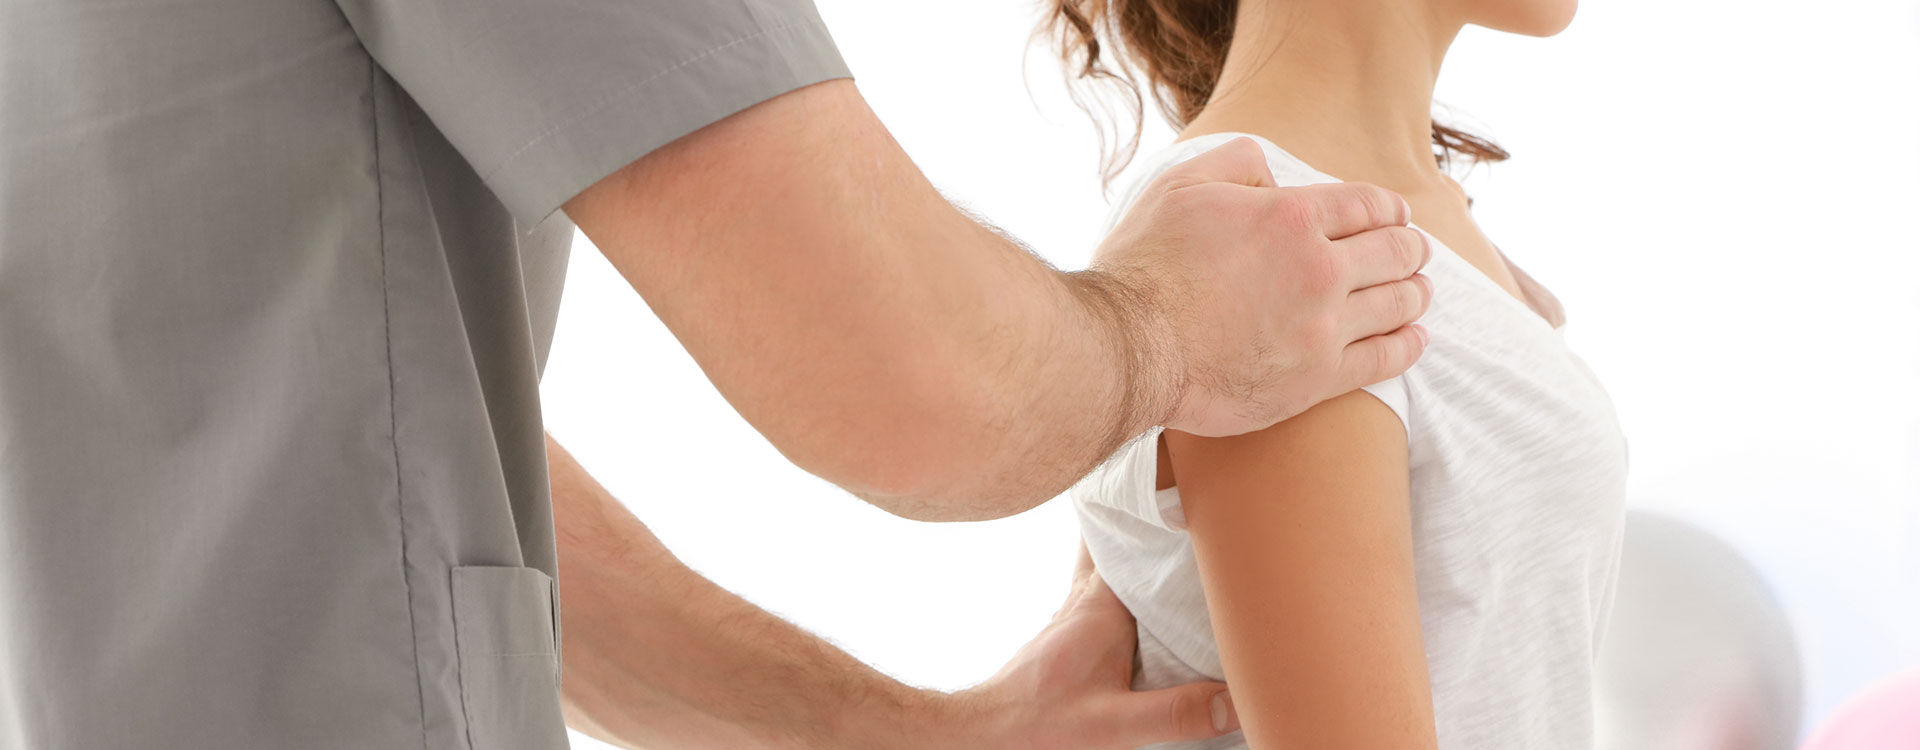 woman-shoulder-massage